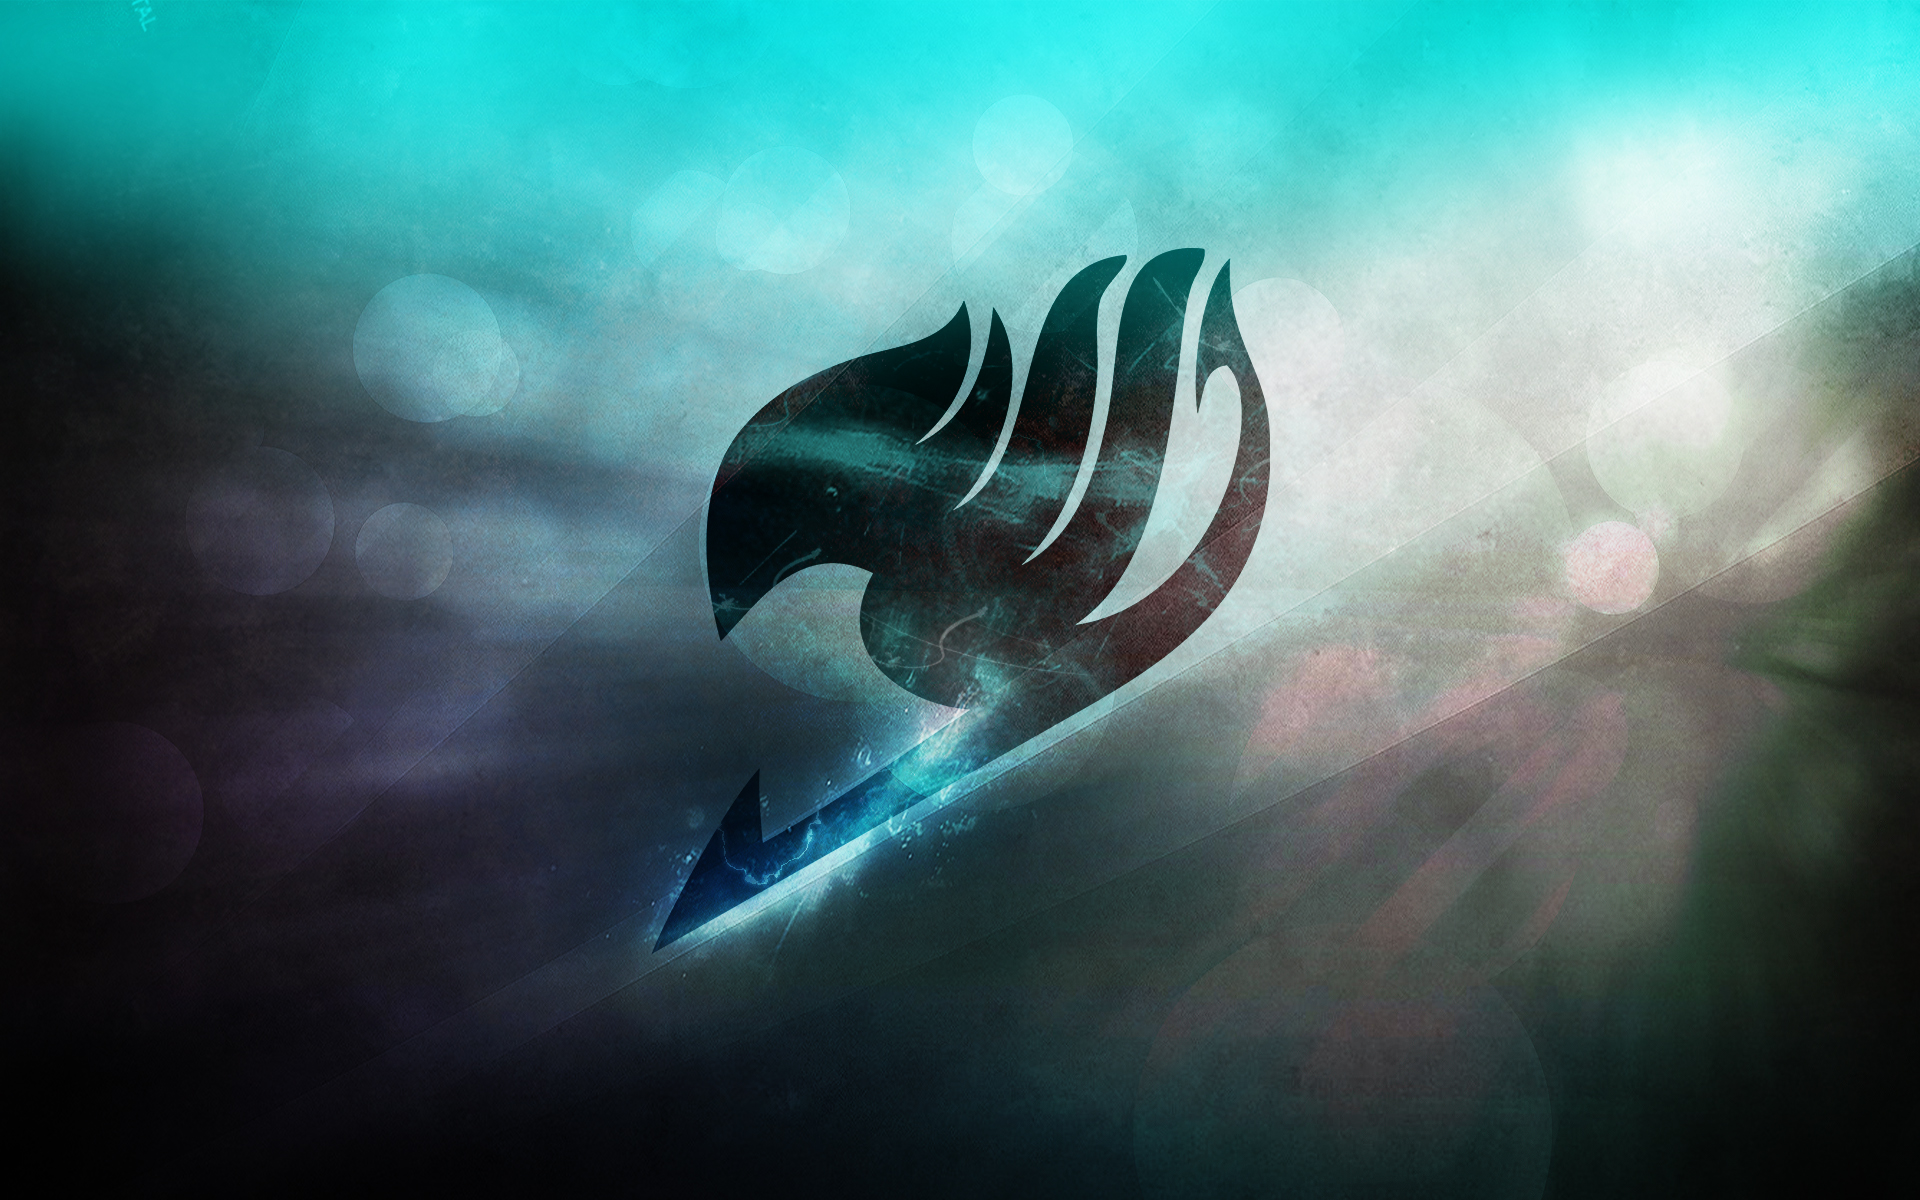 Fairytail logo wallpaper by Cyropath on DeviantArt